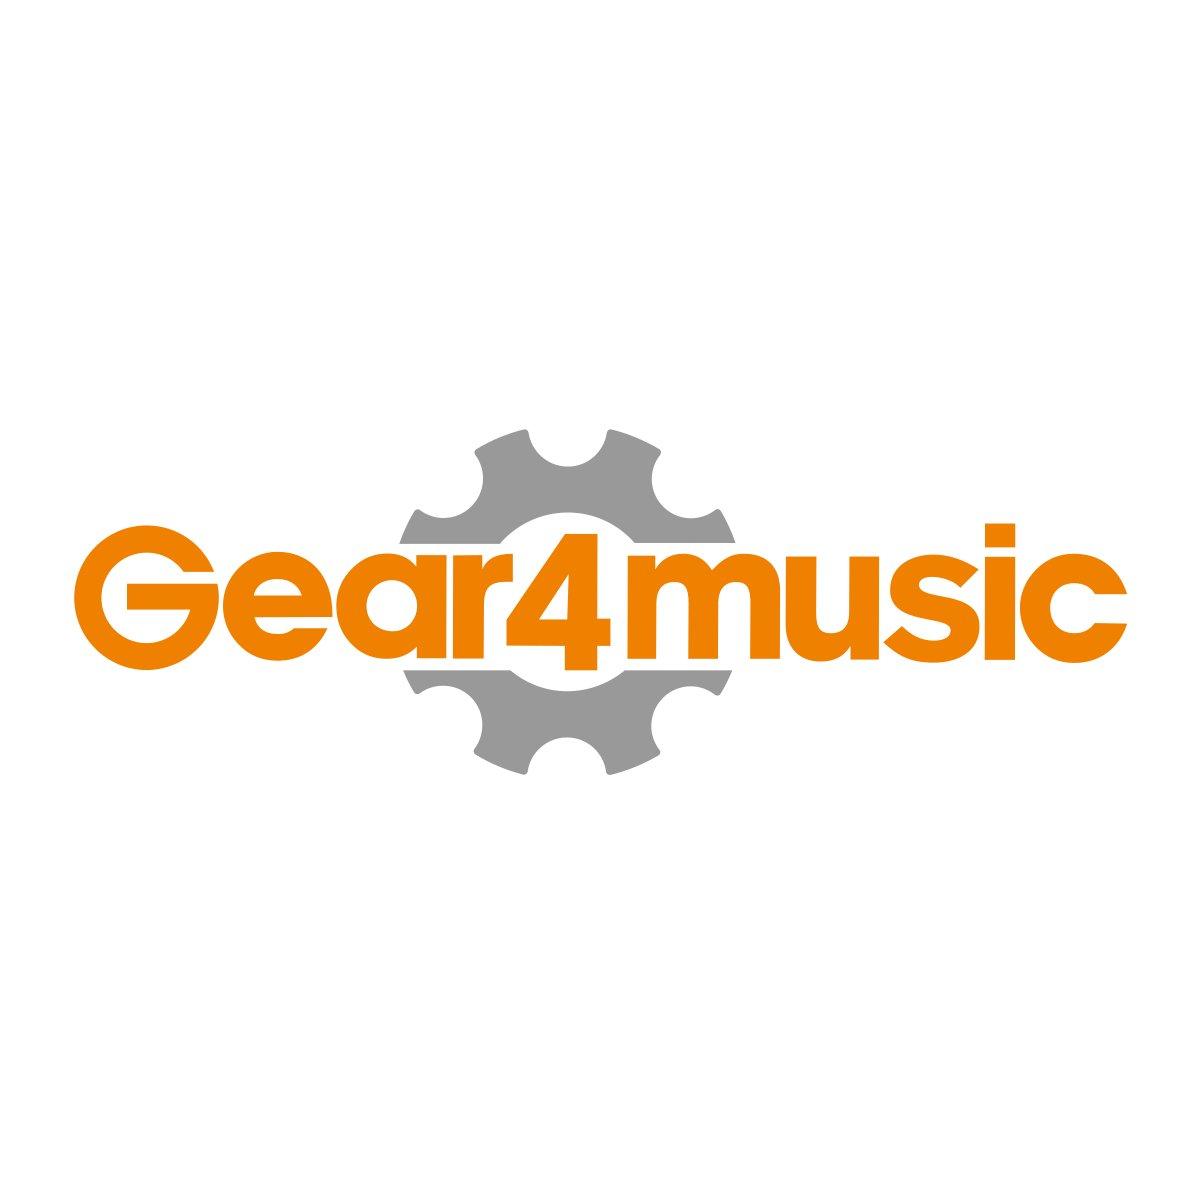 15 Watt Bassverstärker von Gear4music